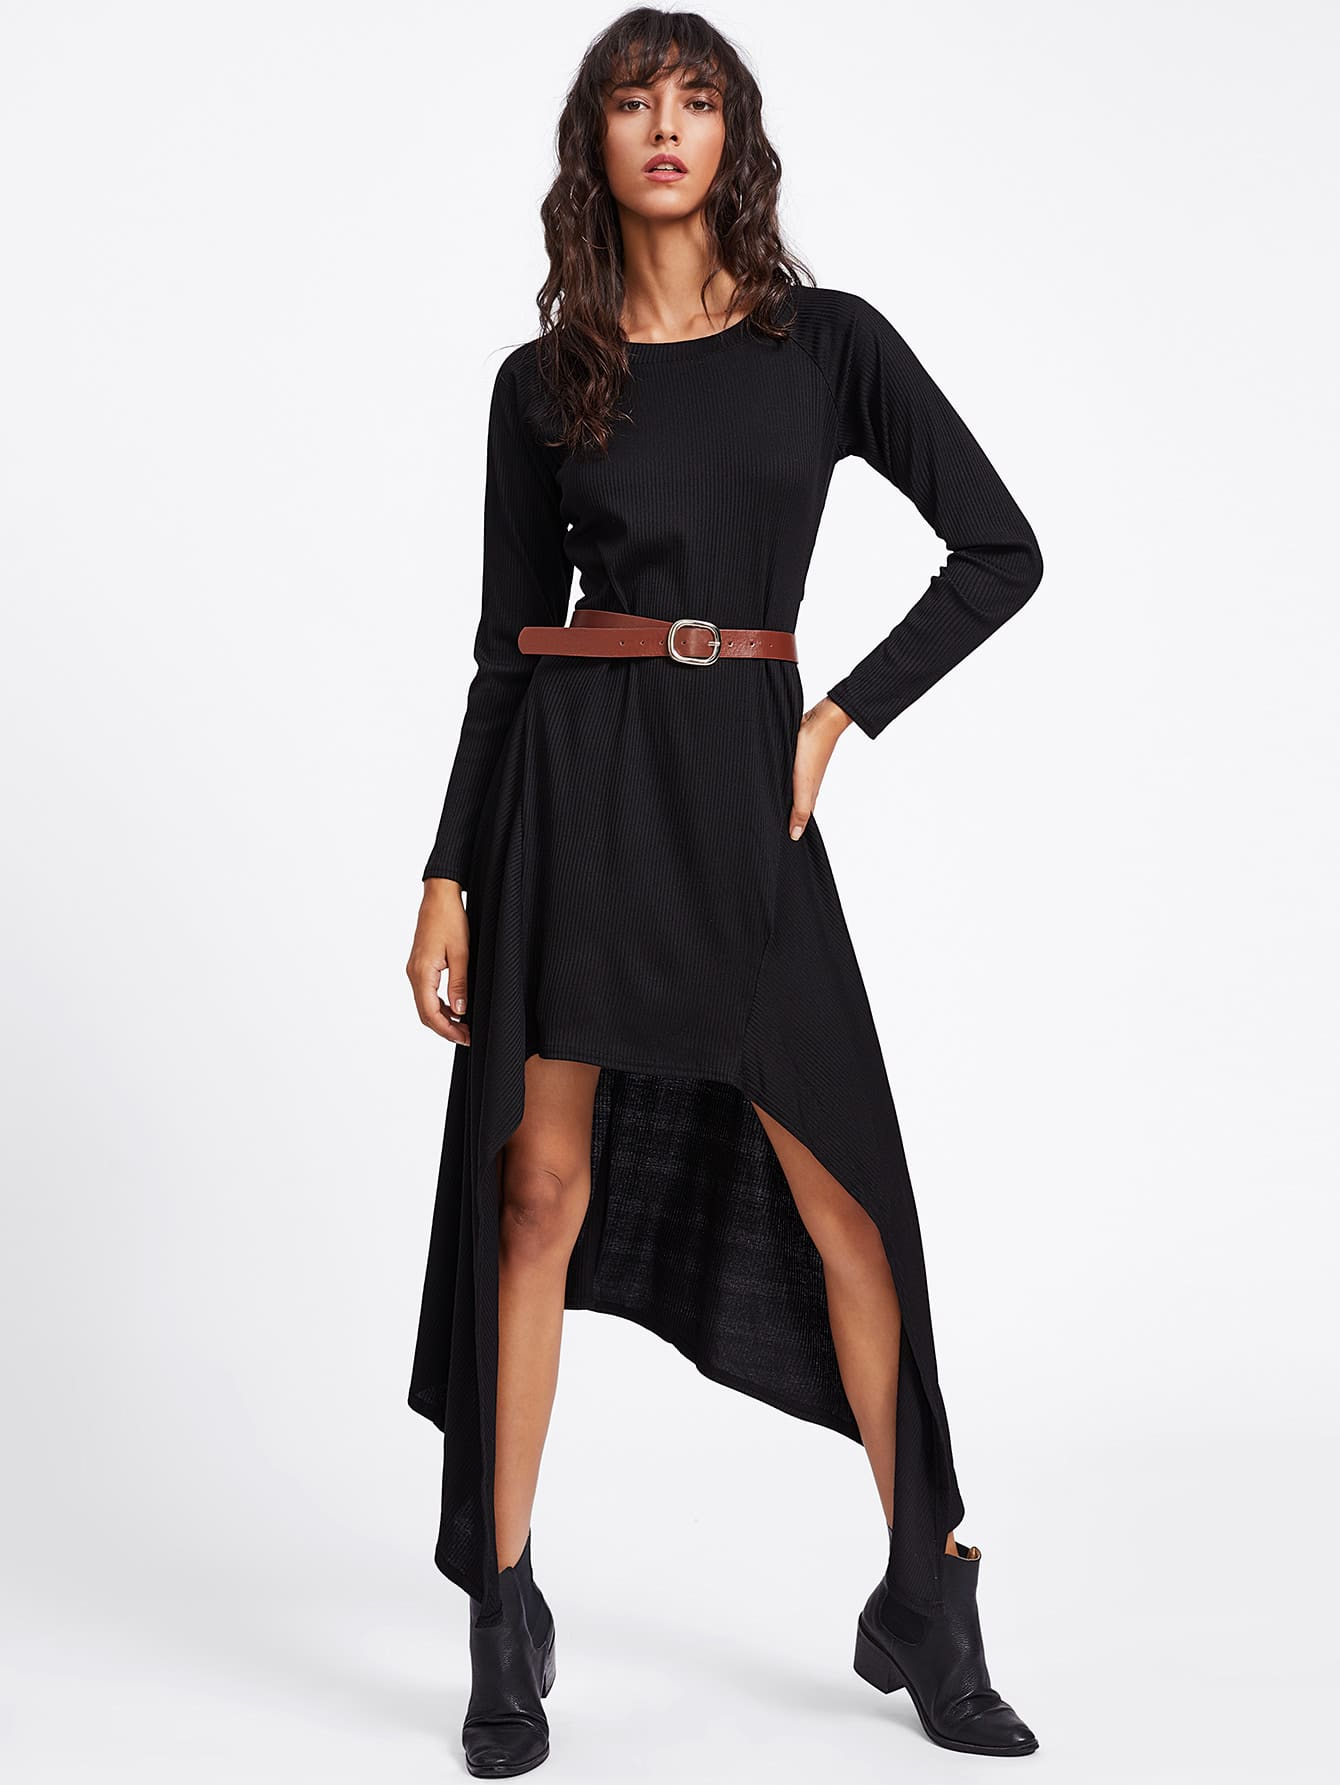 Asymmetric Hem Ribbed Knit Dress With Belt dress170922312